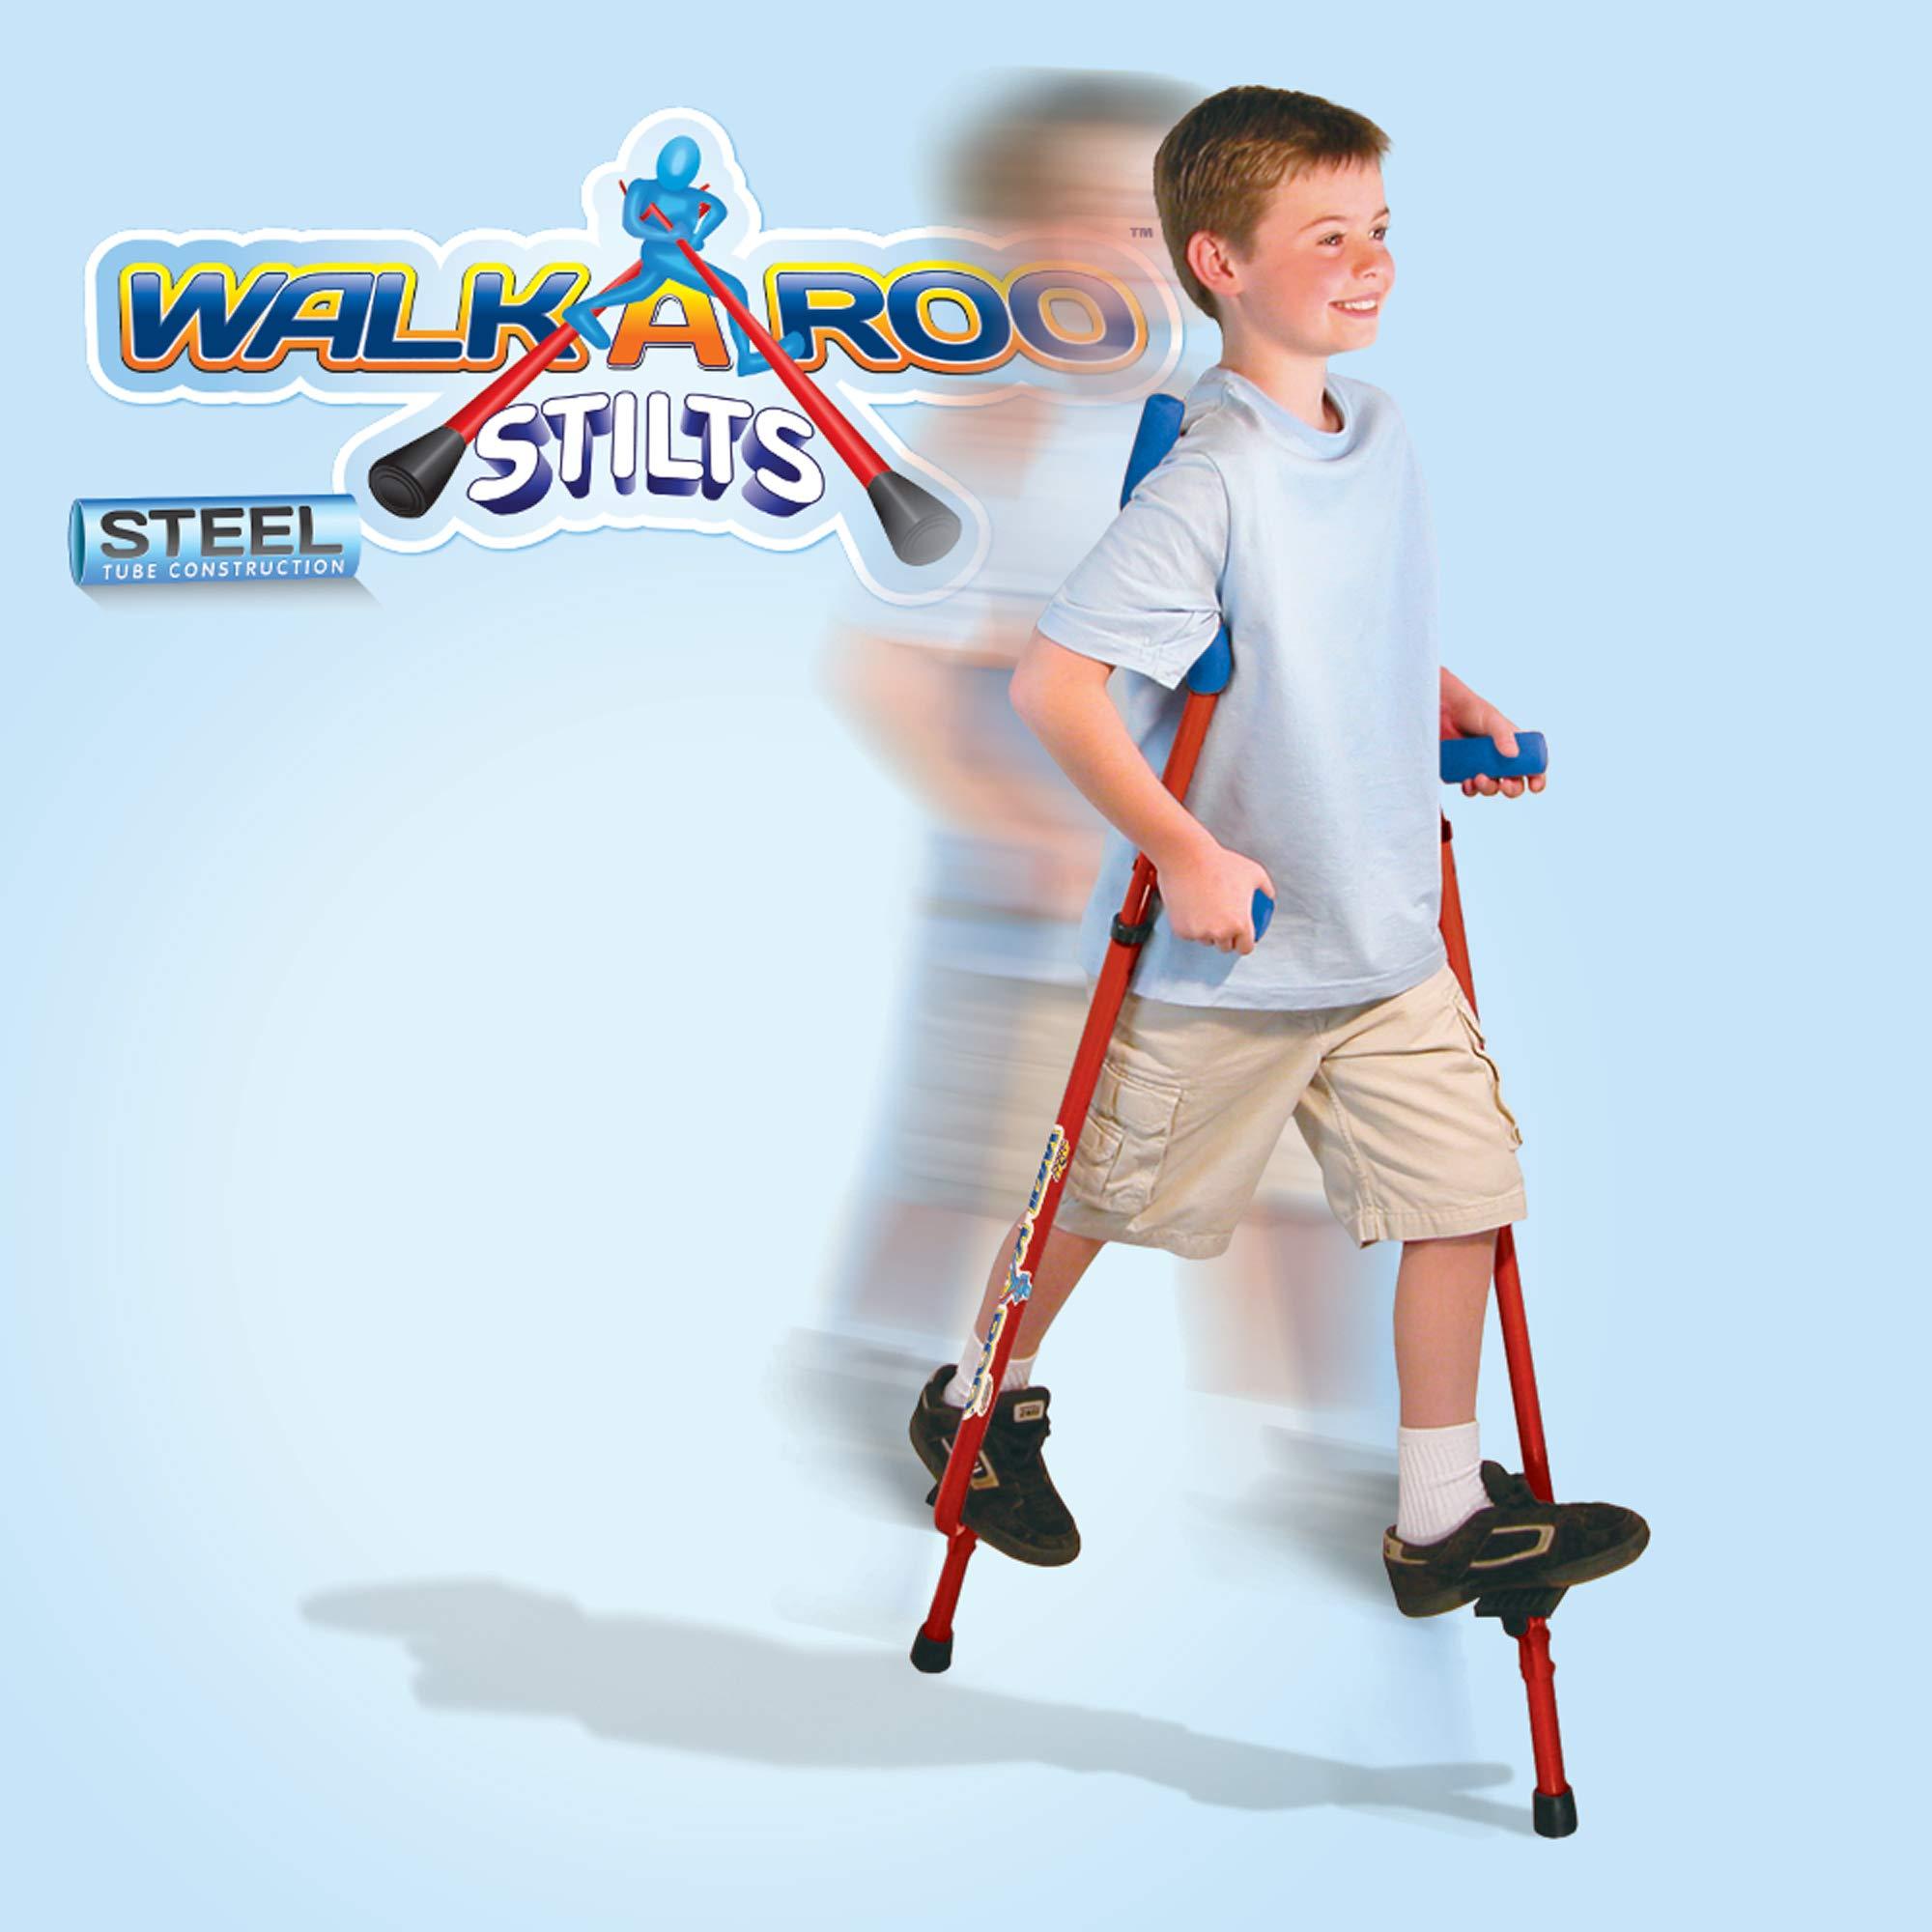 Geospace Original Walkaroo Stilts by Air Kicks (Steel) with Ergonomic Design for Easy Balance Walking, RED